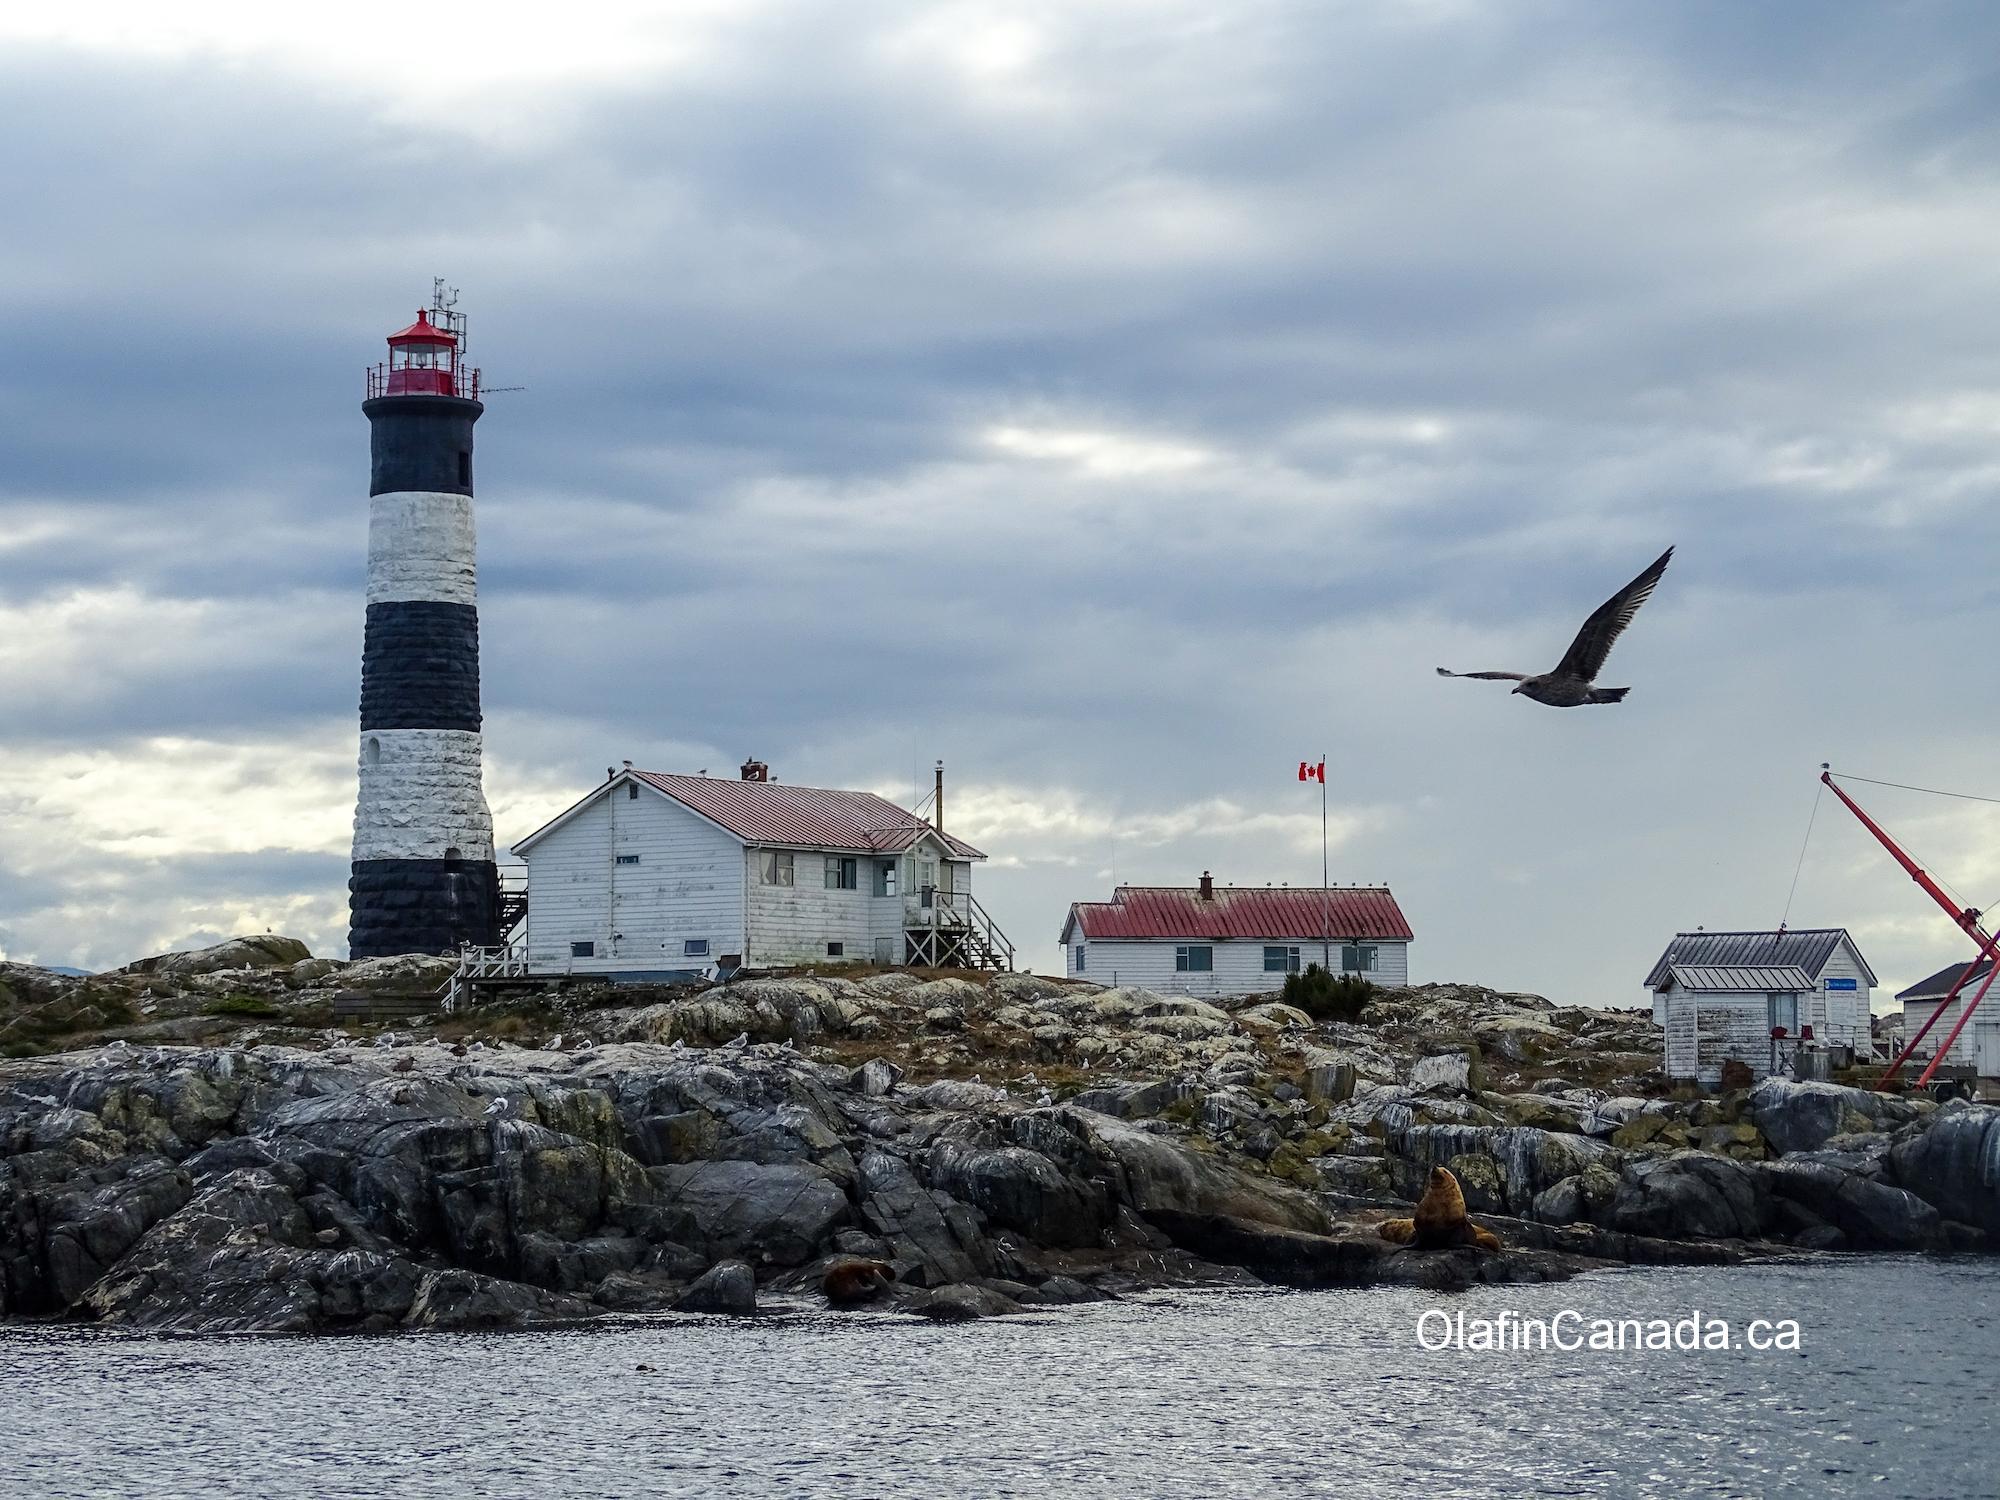 Lighthouse on research island near Victoria #olafincanada #britishcolumbia #discoverbc #victoria #lighthouse